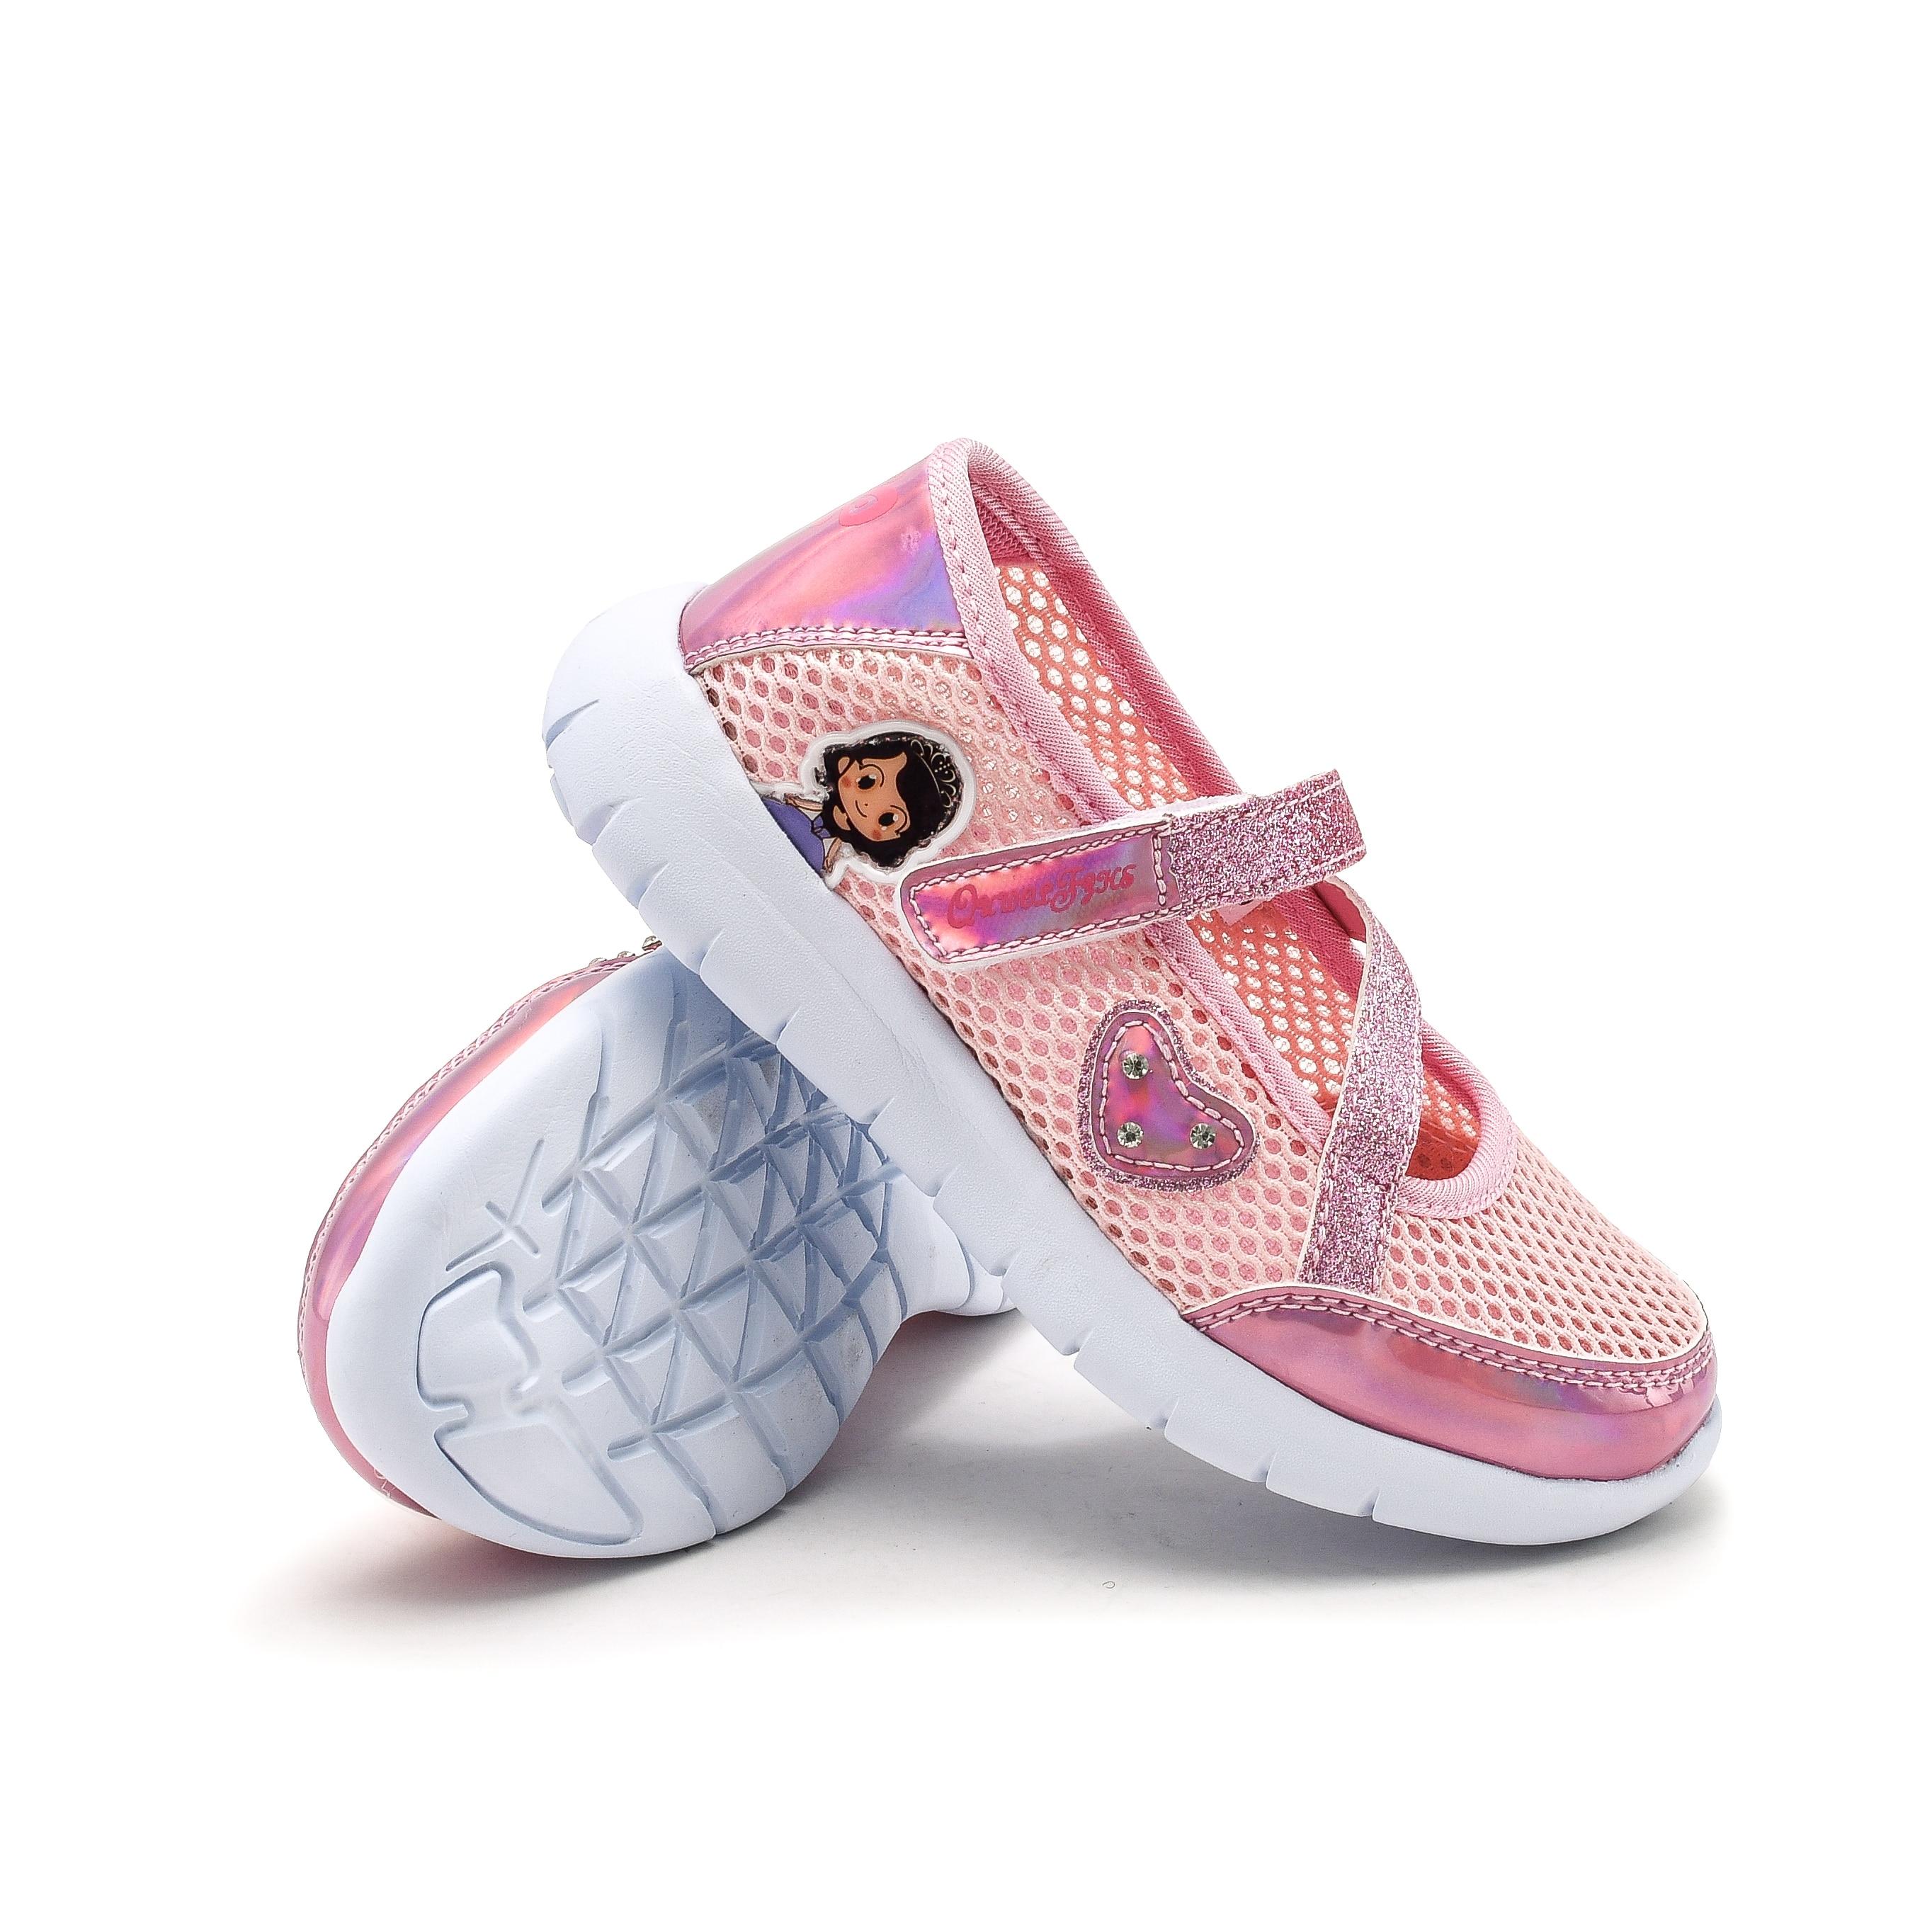 Summer Candy Color Girls Sandals Kids Shoes Princess Mesh Sandalas Fashion Sports Shoes Girls Hollow Out Flats Shoes